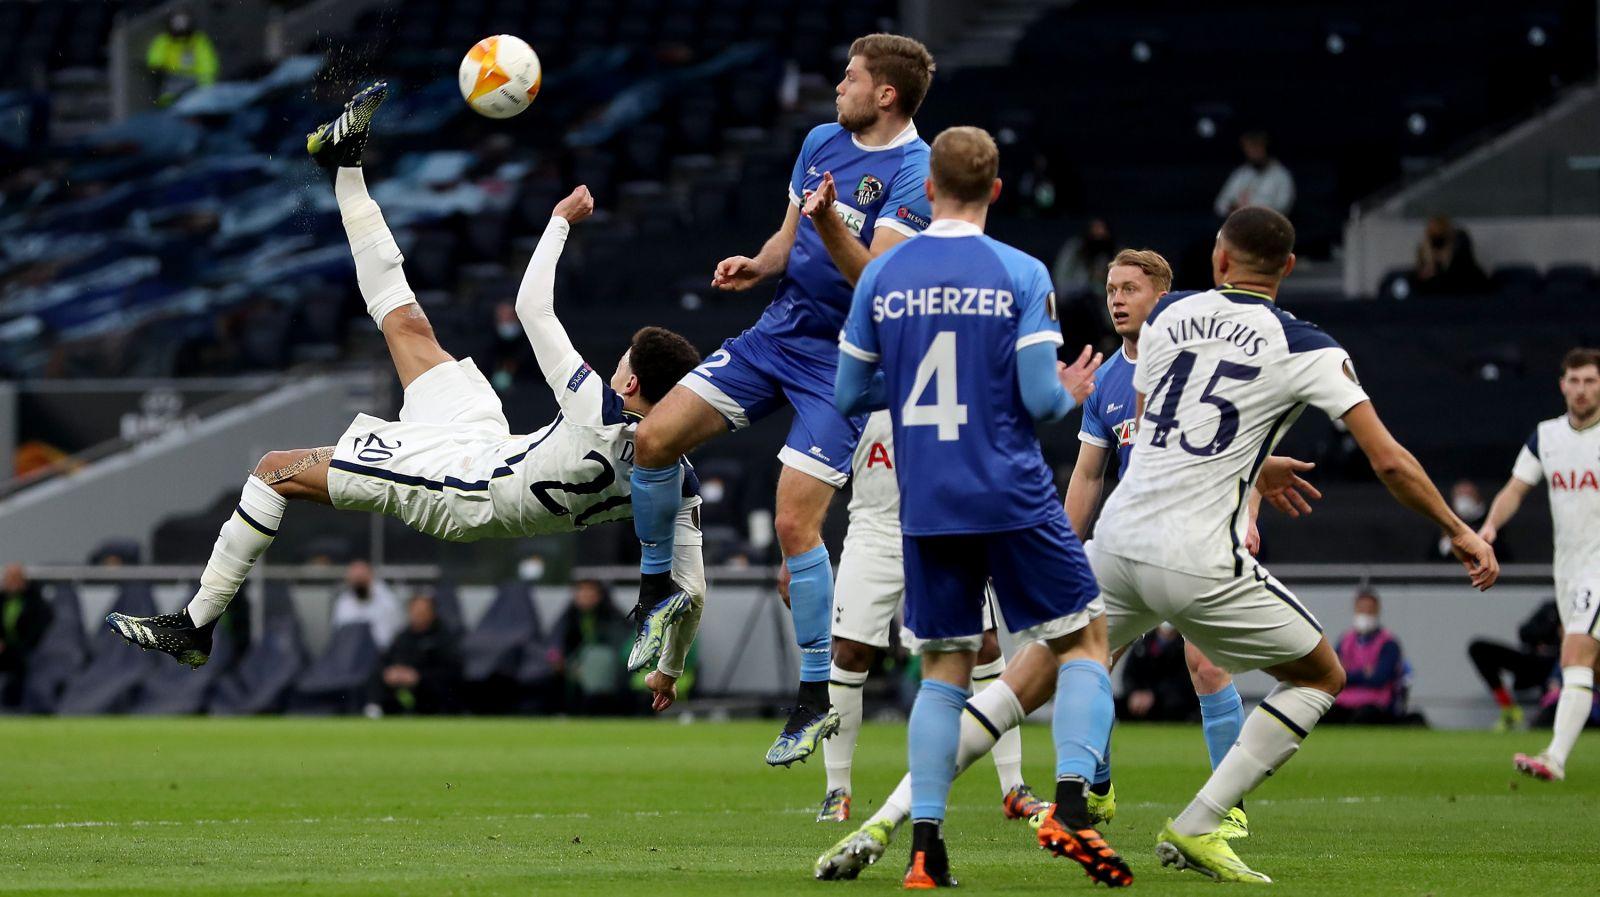 Momen Dele Alli mencetak gol salto dalam laga Tottenham vs Wolfsberger. (foto: twitter.com/SpursOfficial)